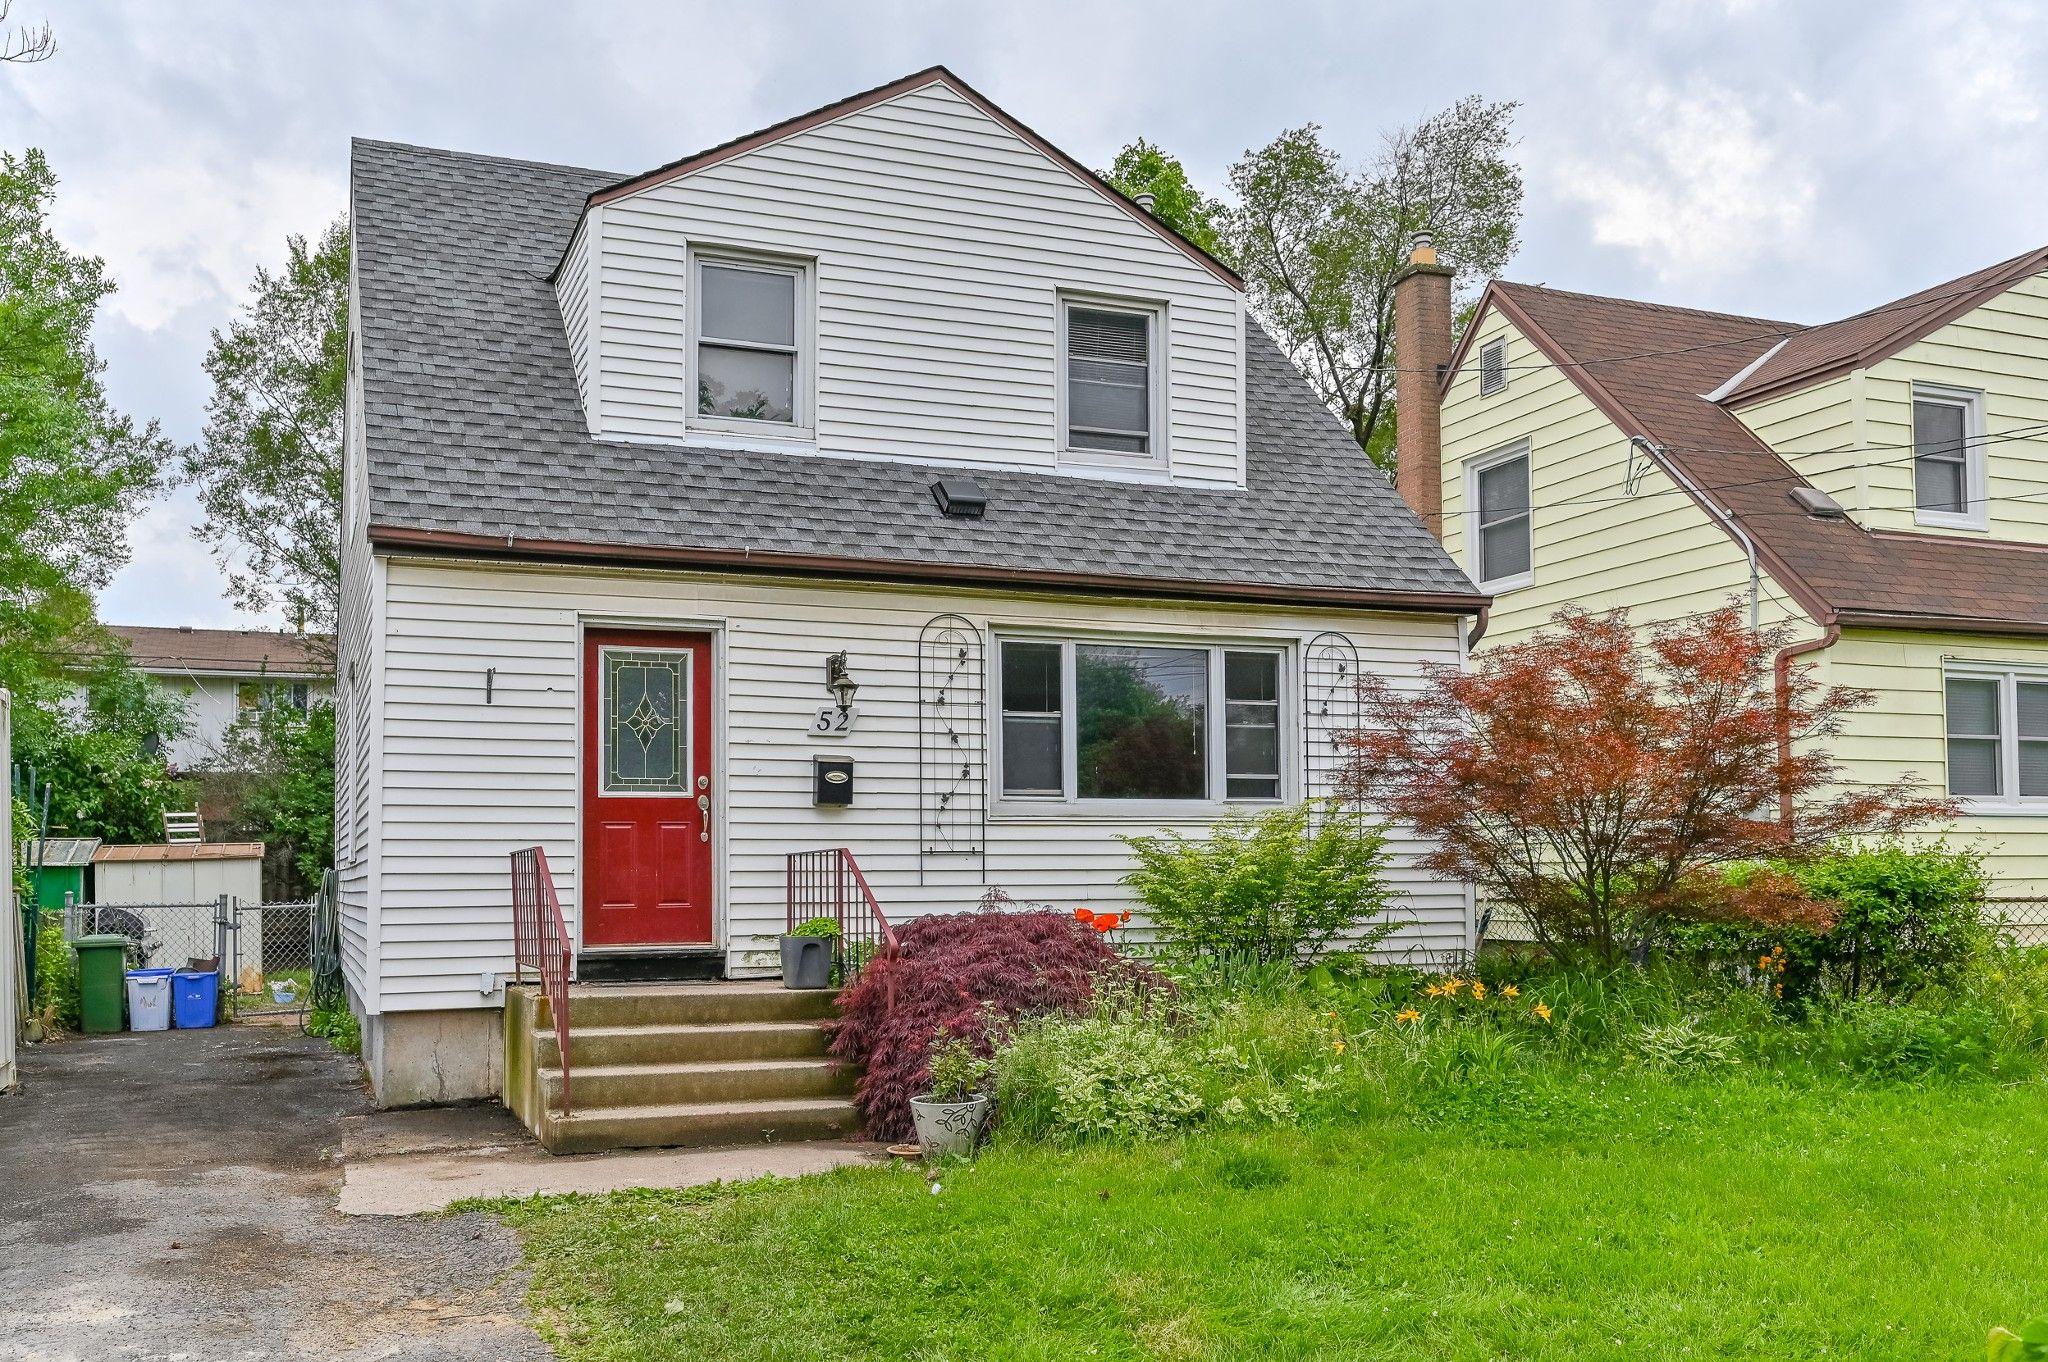 Main Photo: 52 Martha Street in Hamilton: House for sale : MLS®# H4062647